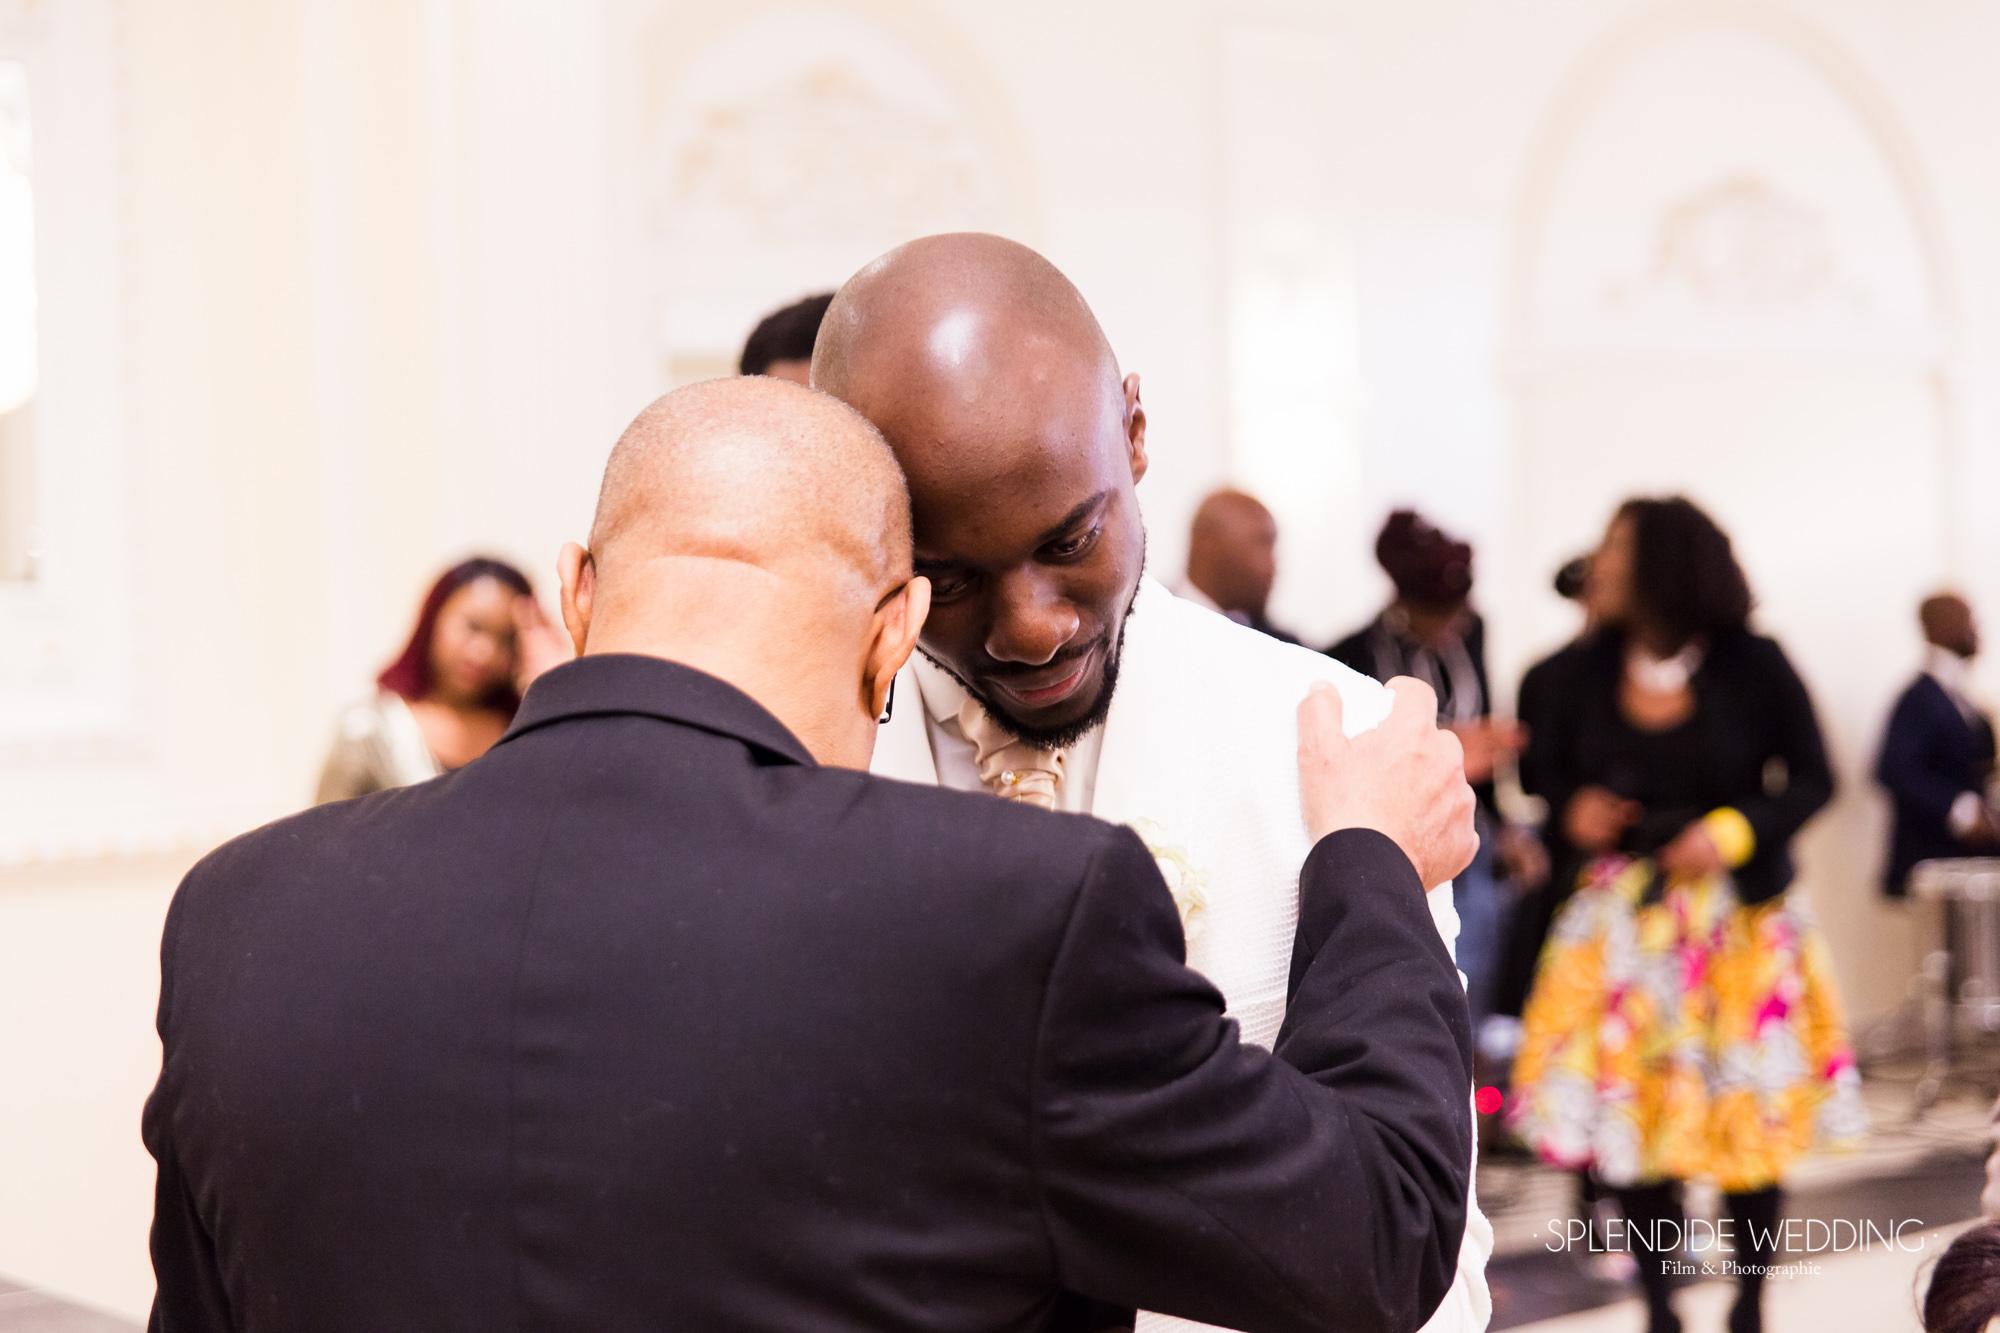 Photographe mariage Paris 19ème Chantal & Darius accolade de famille